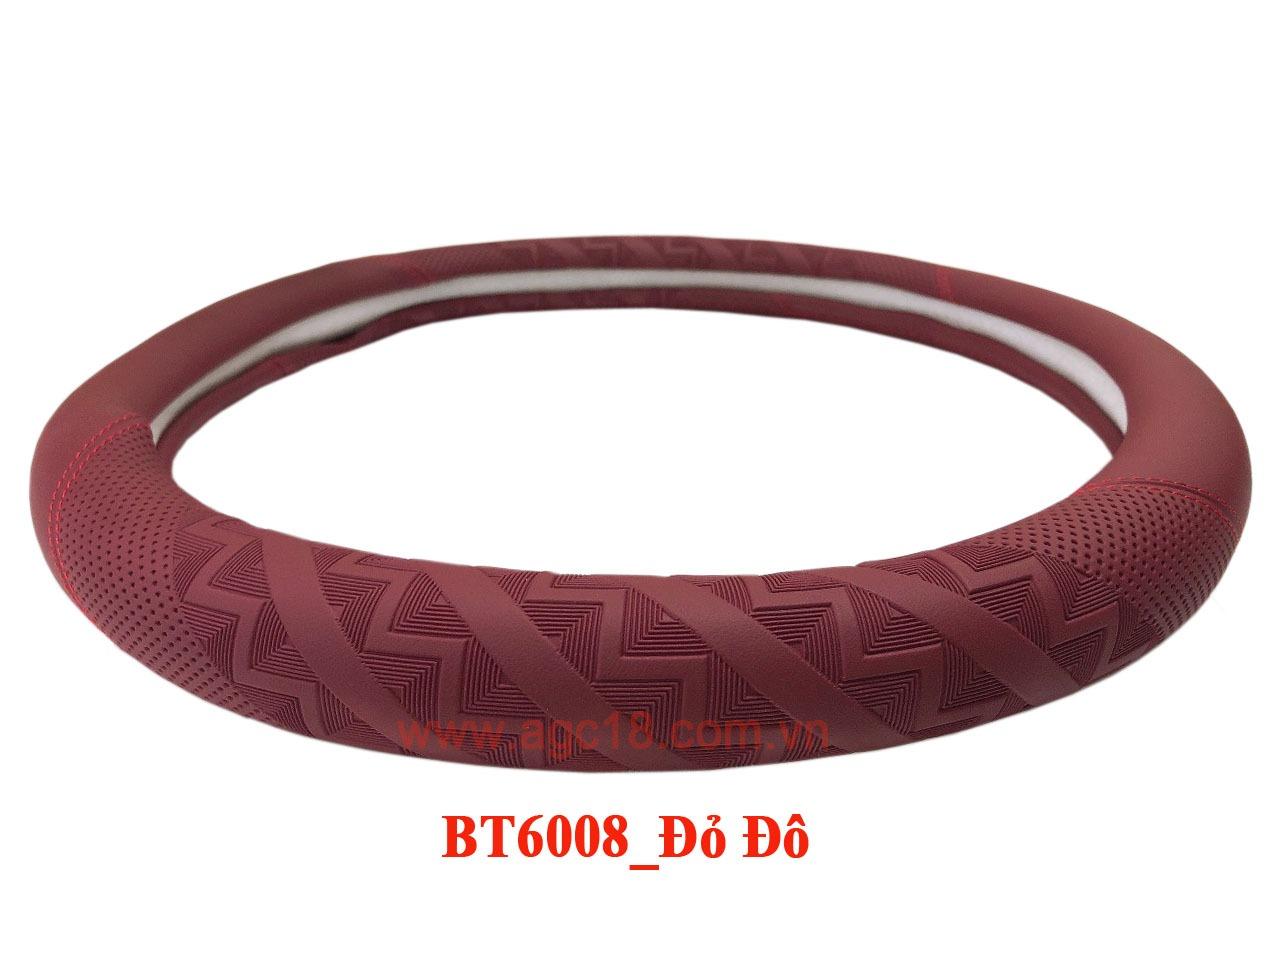 Bao tay lái BT6008_Đỏ đô.1